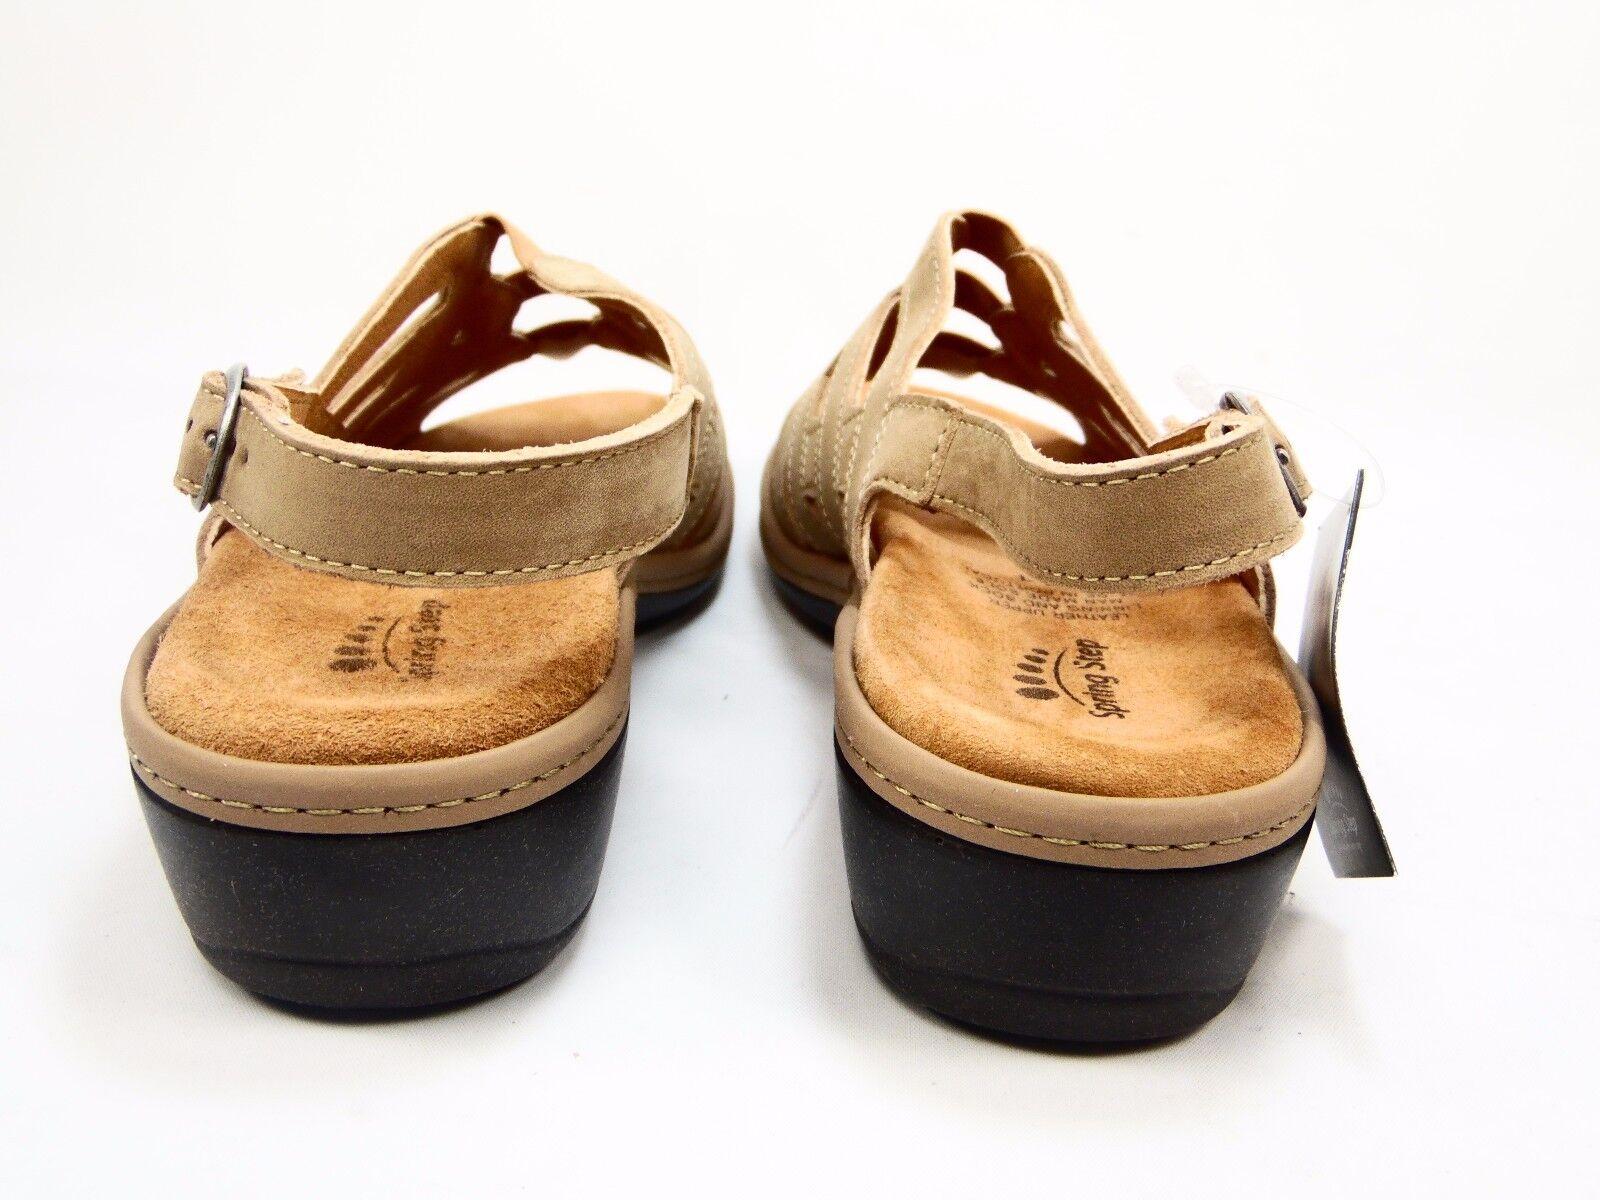 Spring Step Kaylana Kaylana Kaylana Slingback Sandals Tan Nubuck Dimensione 41(US 9.5-10) 780e60